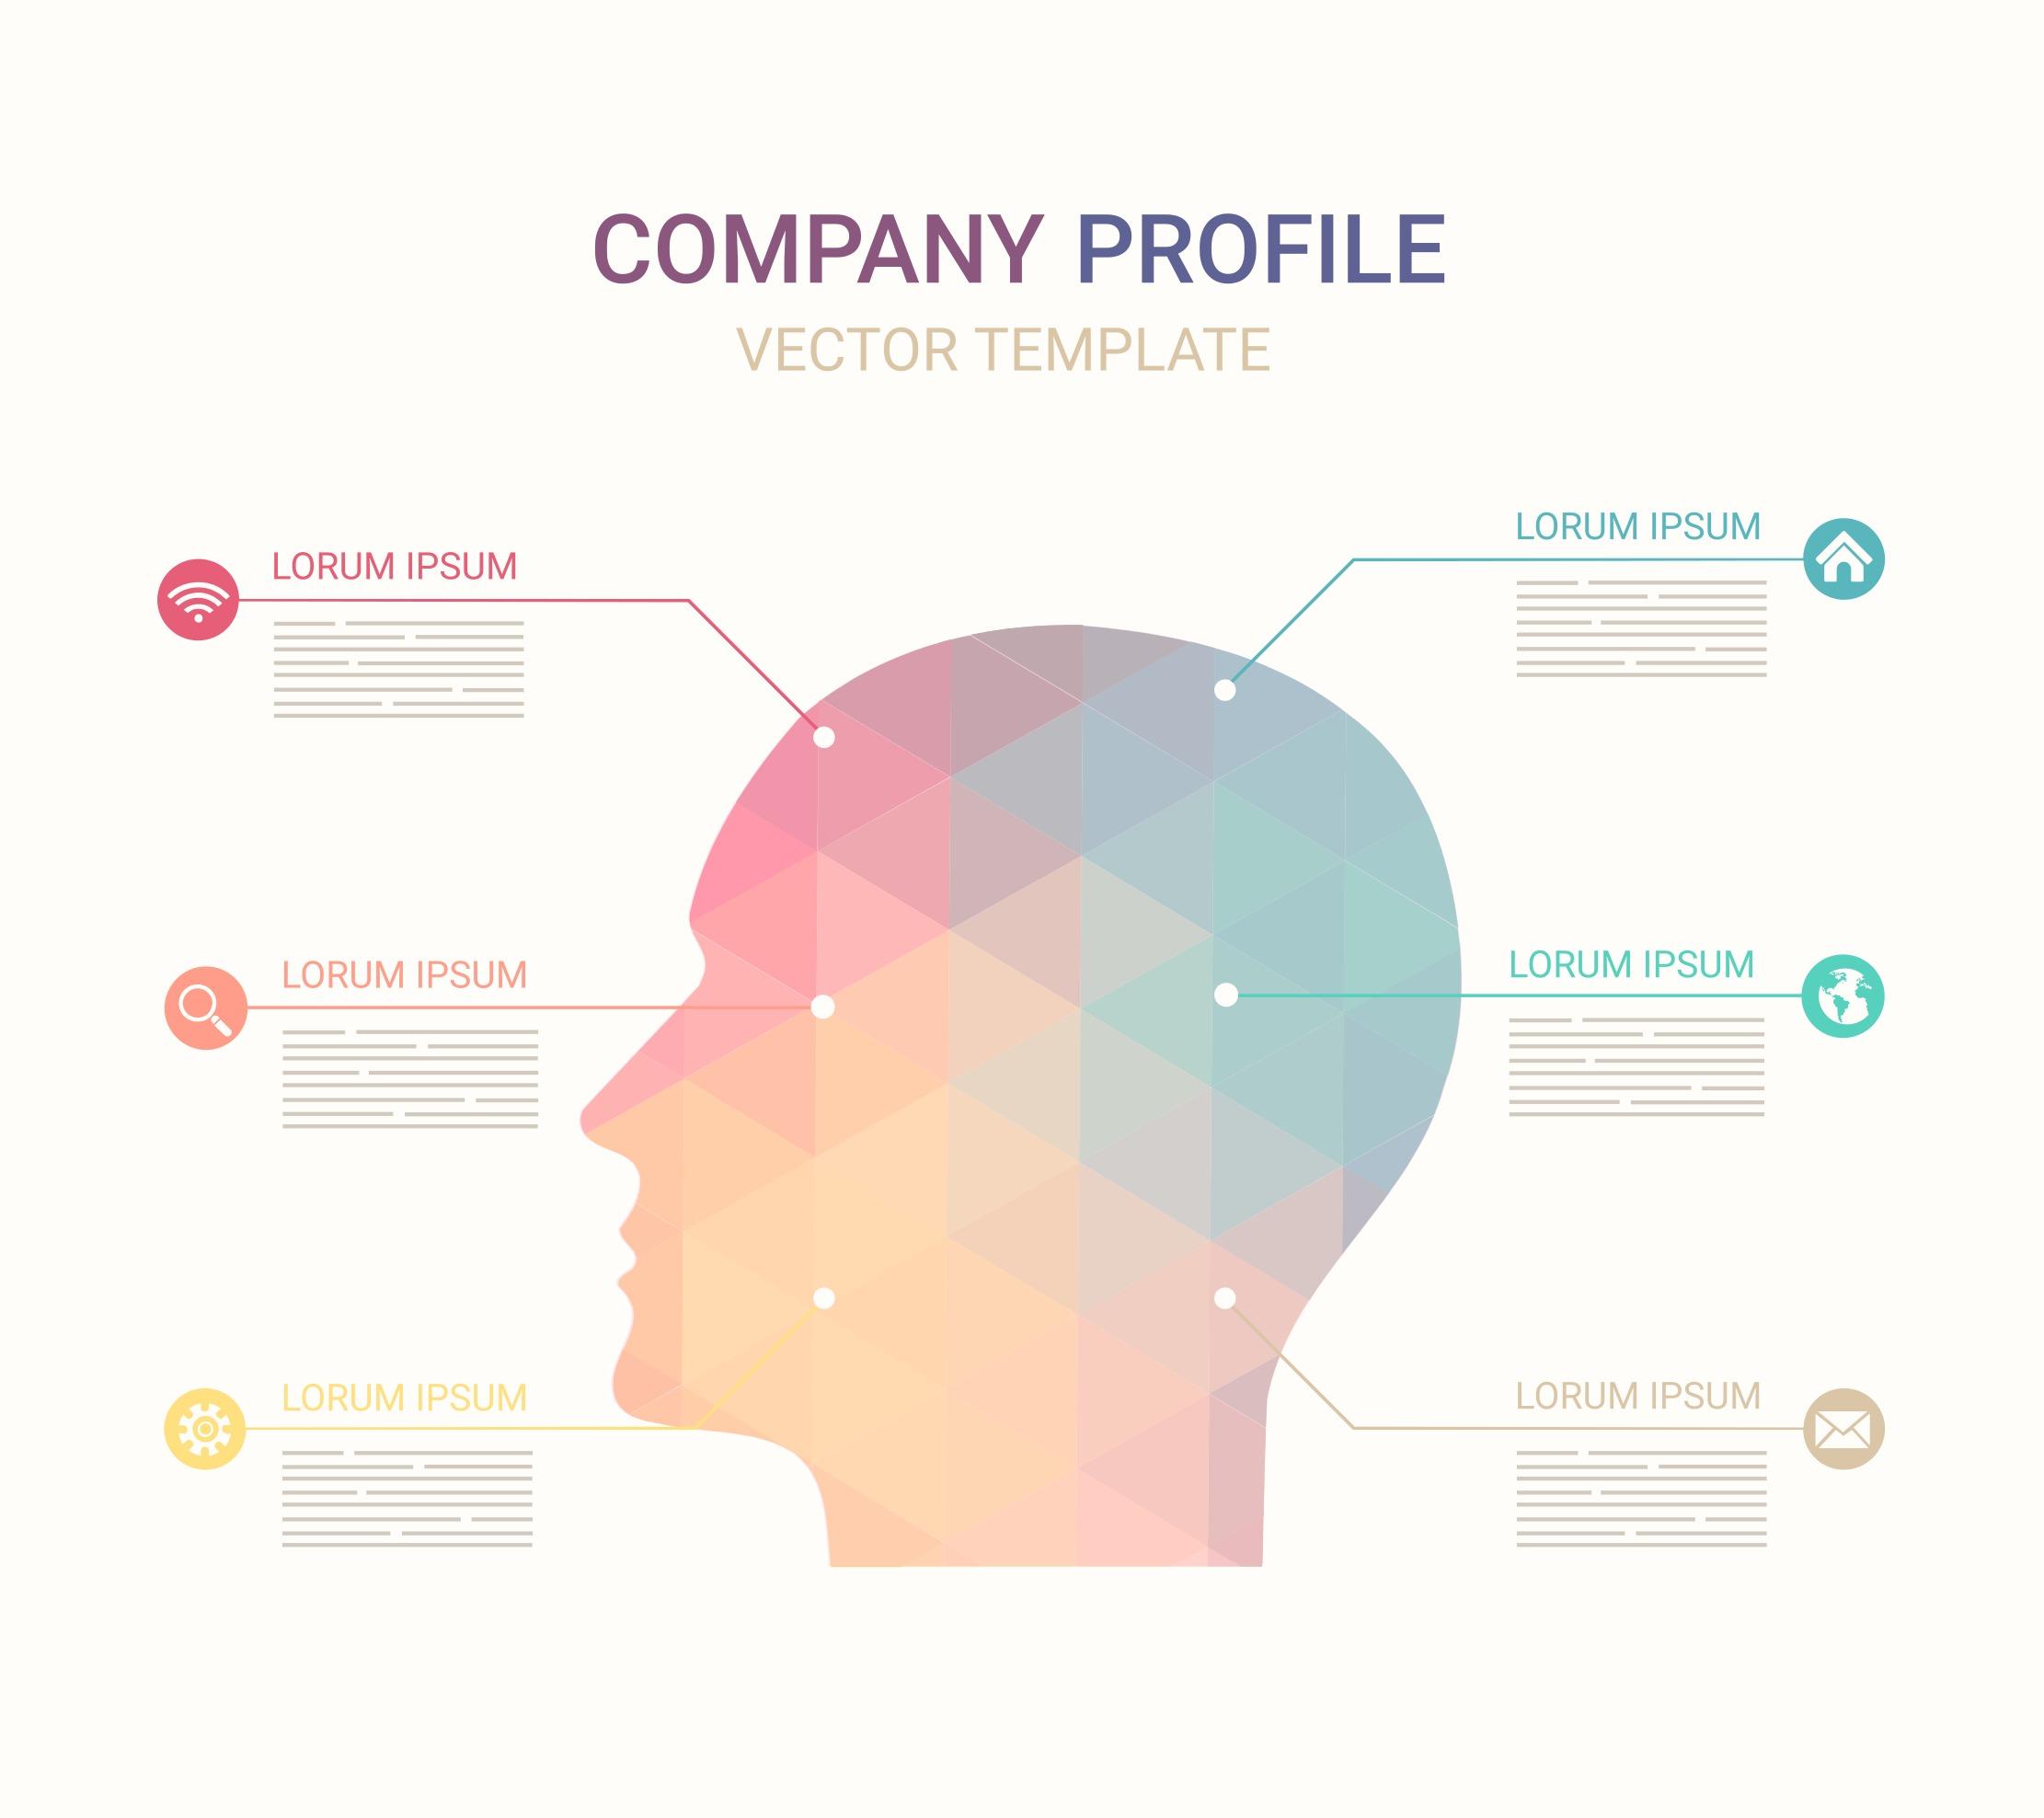 Professional Business Profile Template Template Examples – Business Profiles Samples